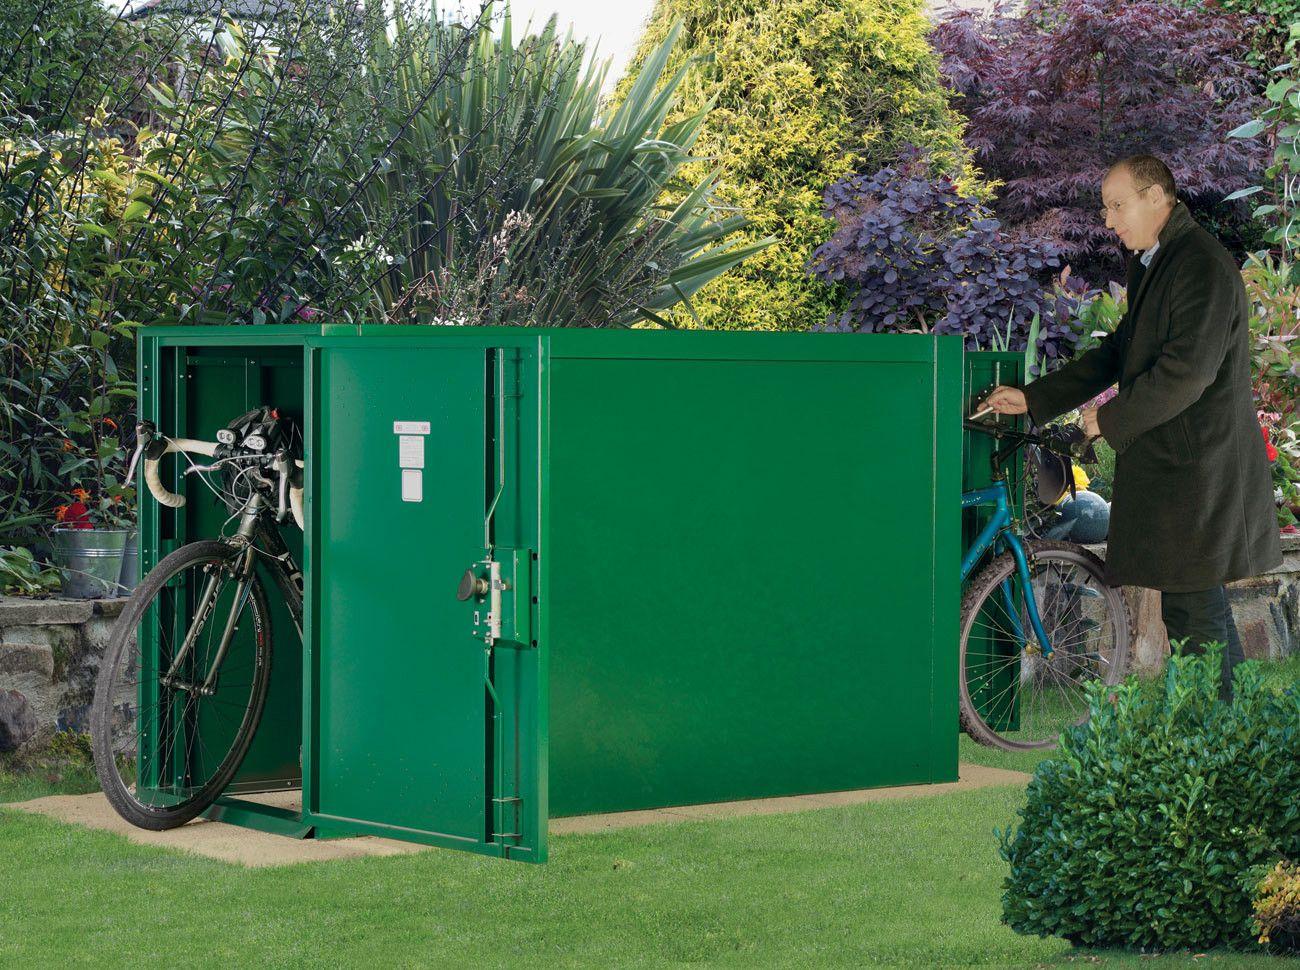 Double Ended Metal Bike Shelter Bike Locker Bike Storage Bike